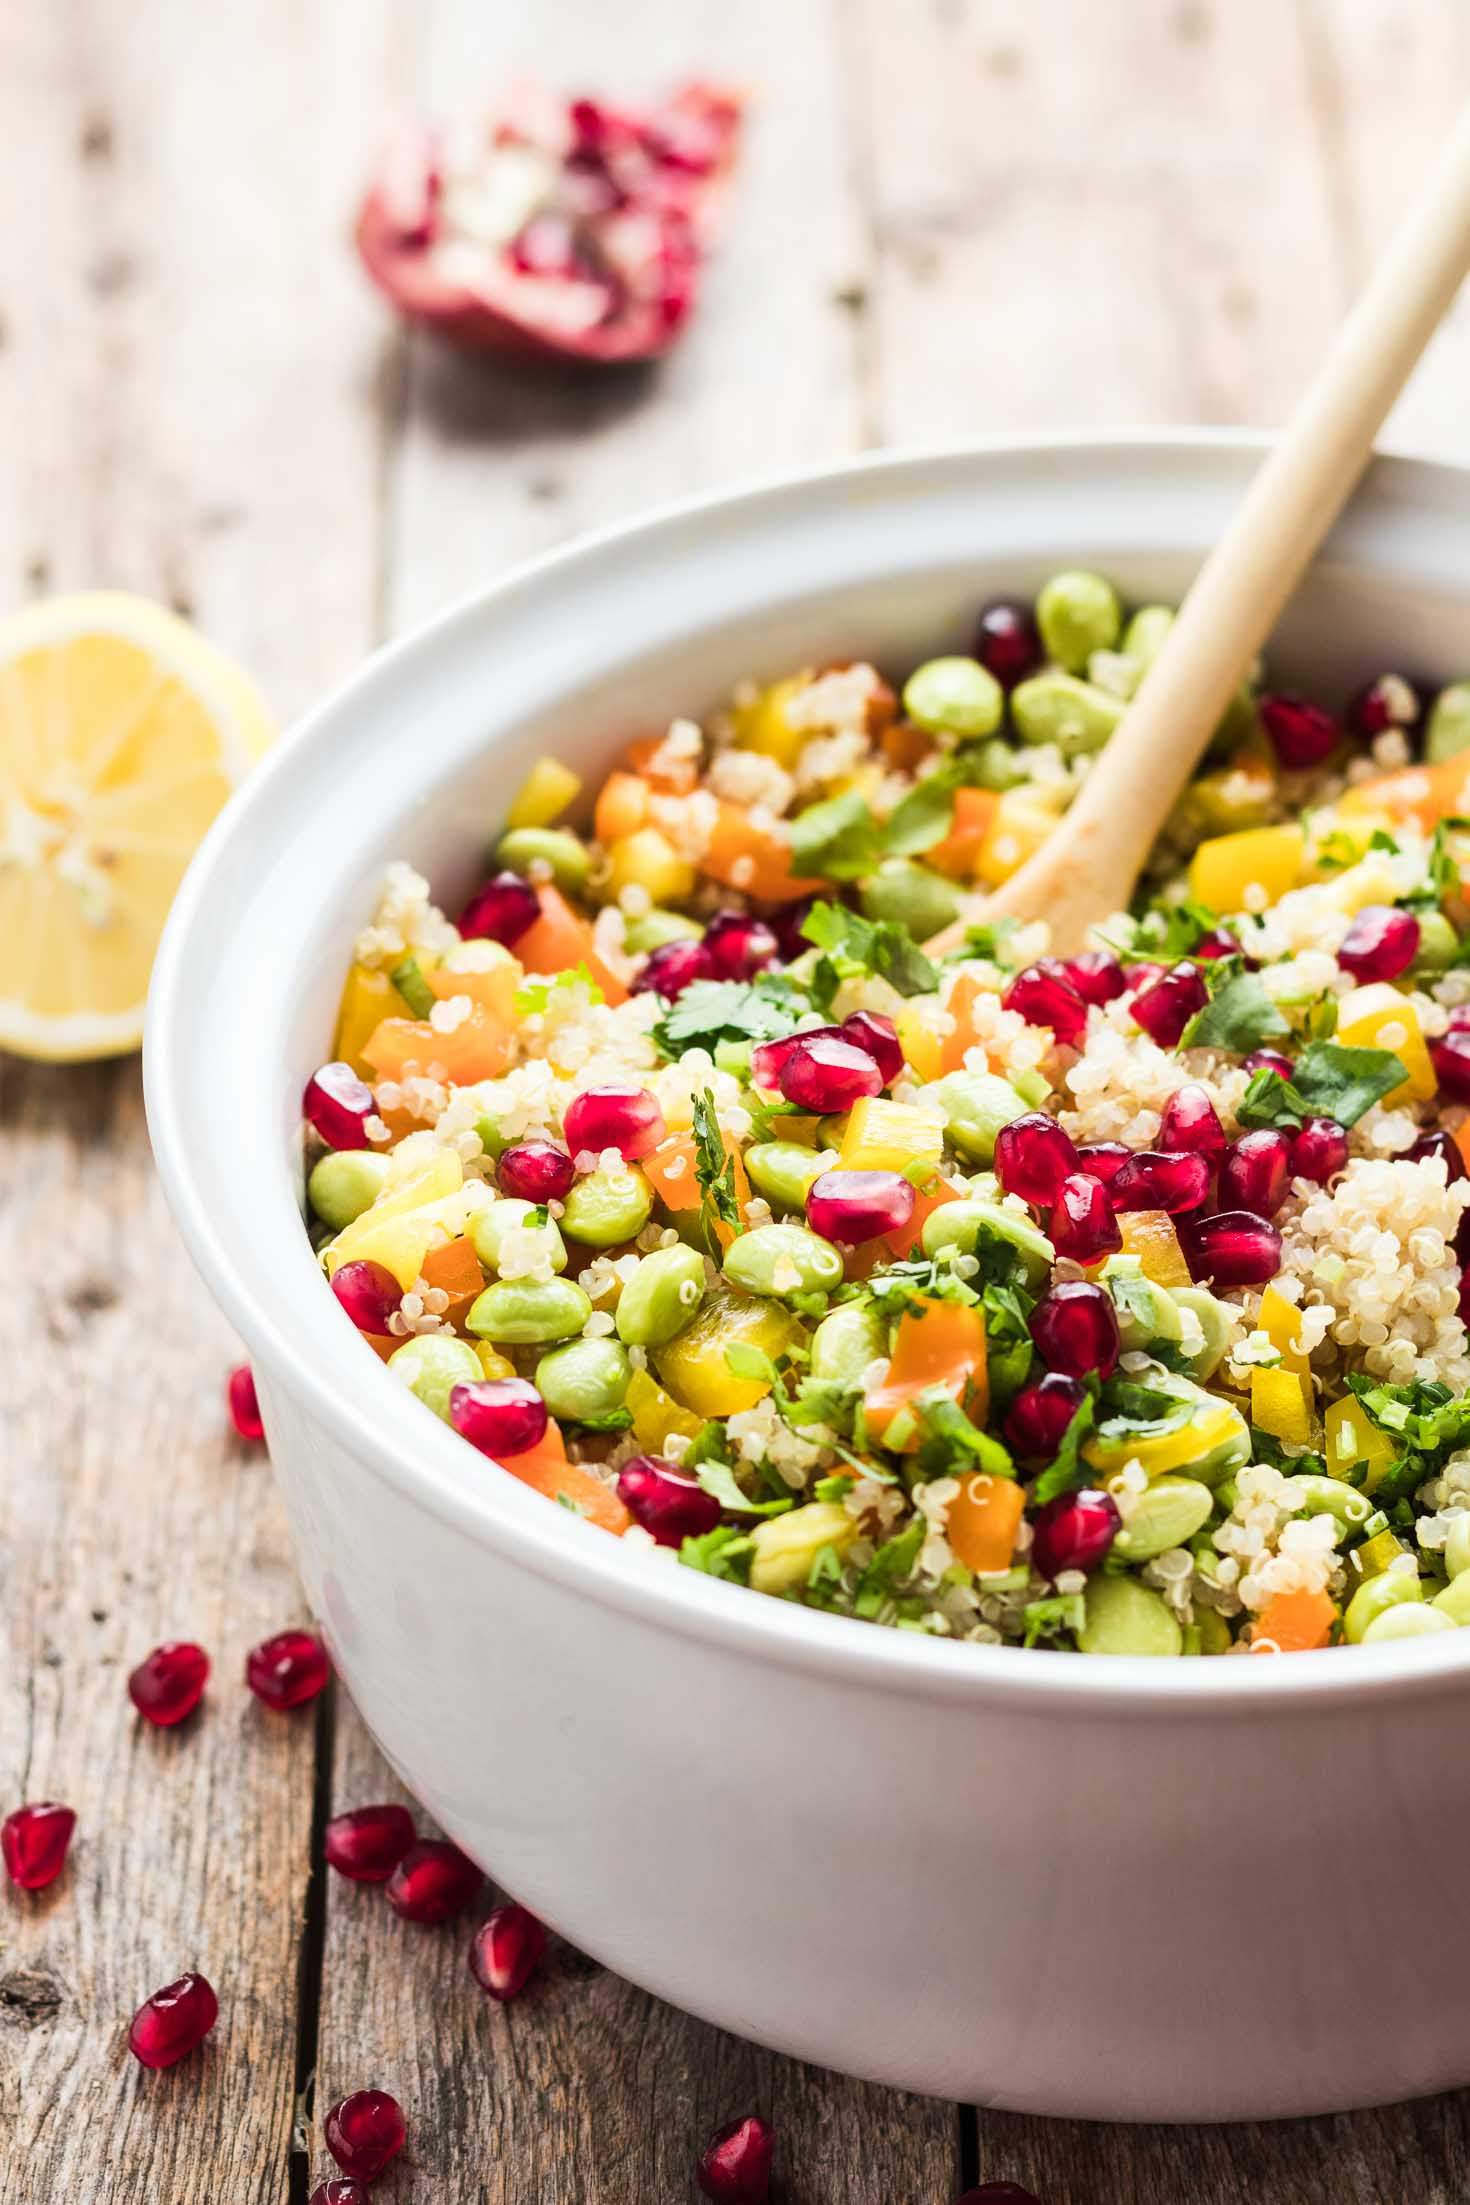 Salad Recipes With Quinoa And Pomegranate